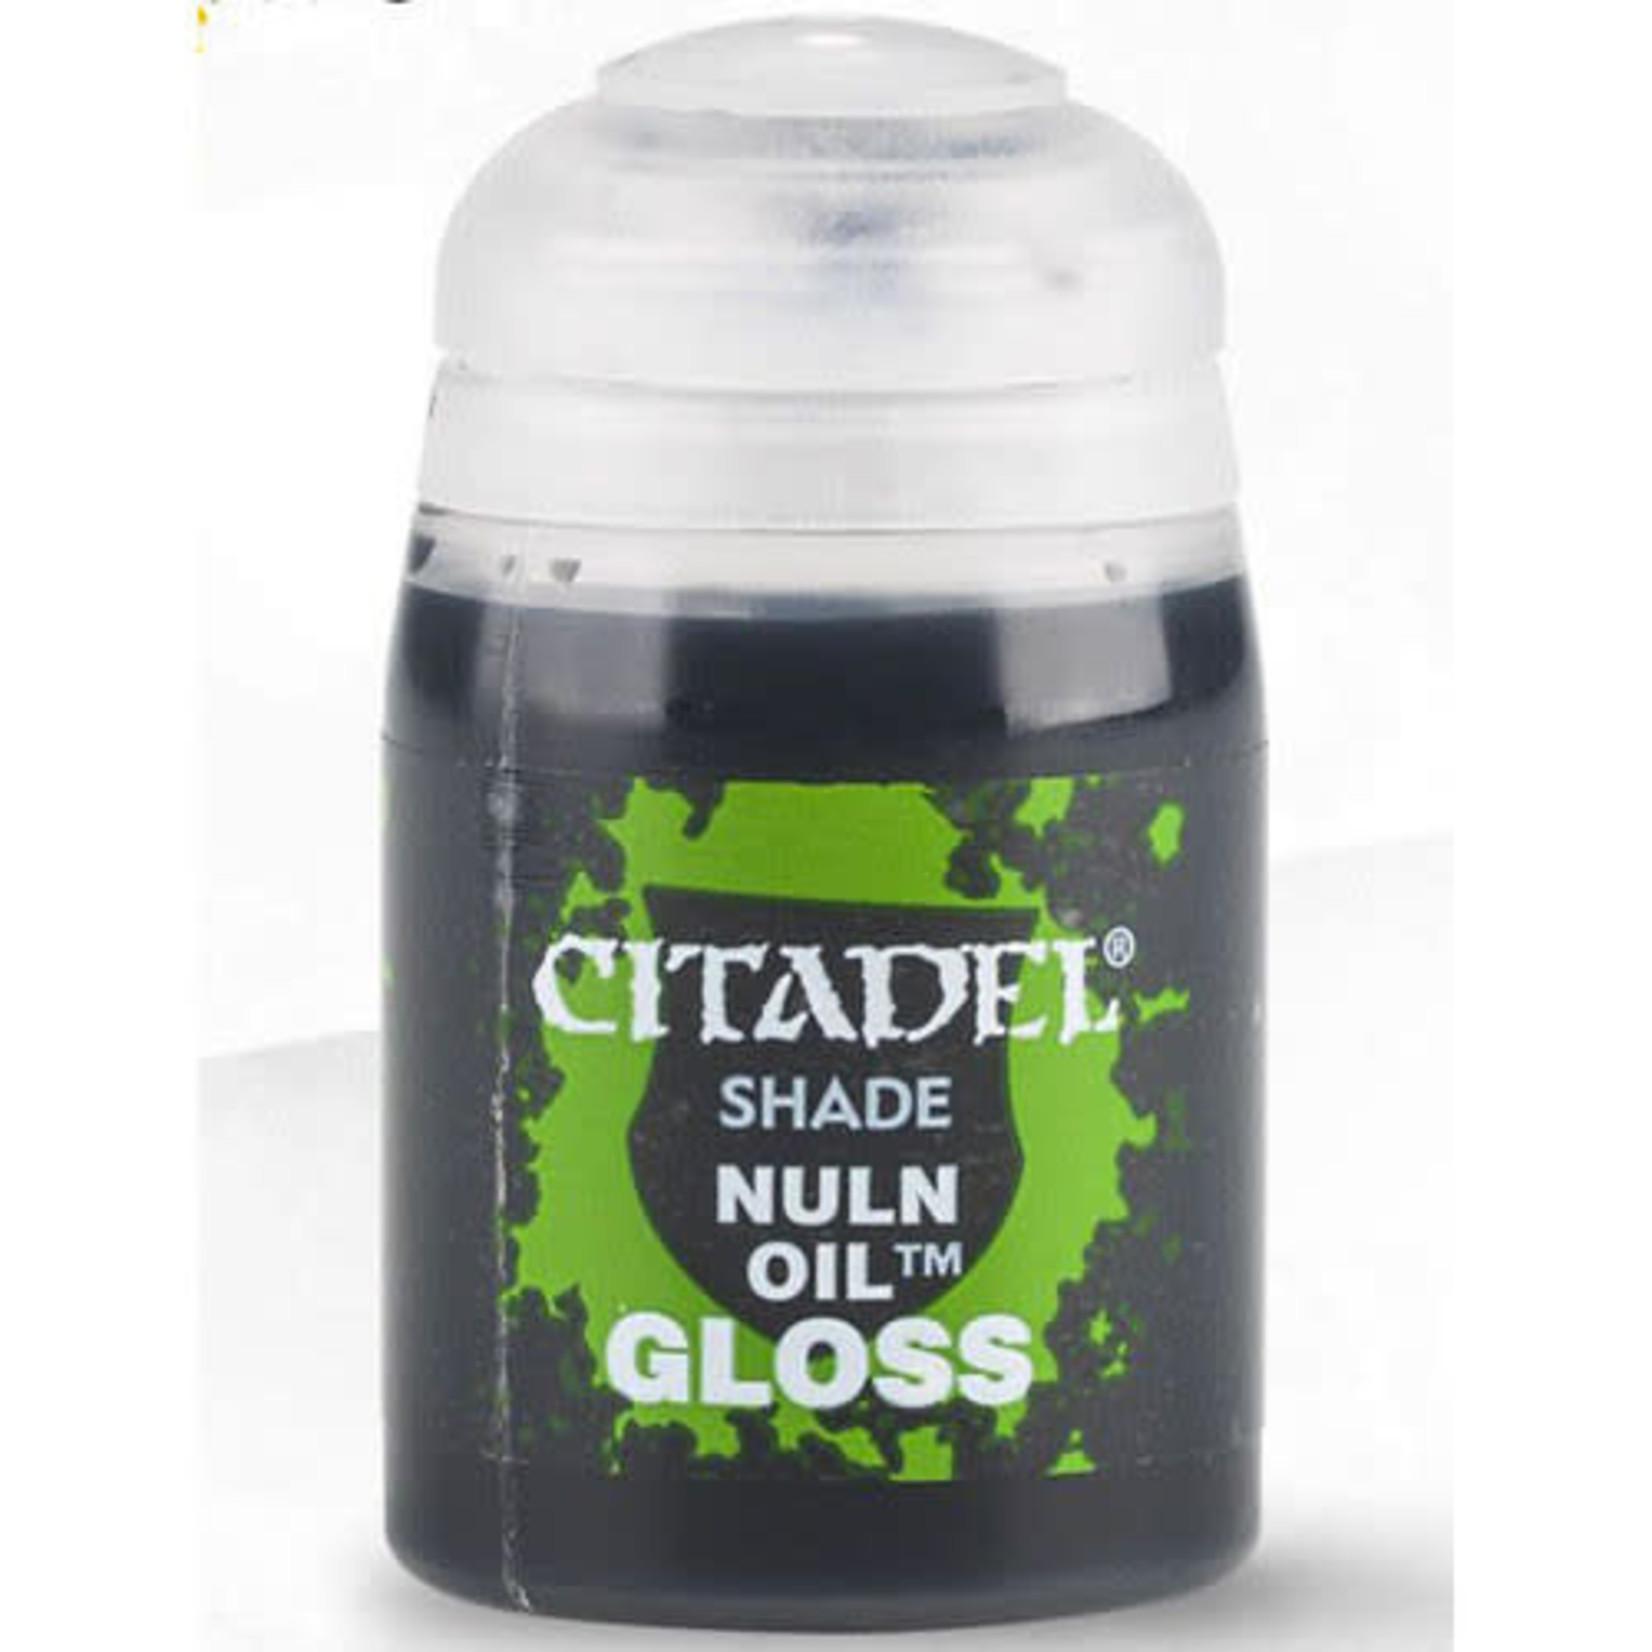 Citadel Citadel Paint - Shade: Nuln Oil GLOSS